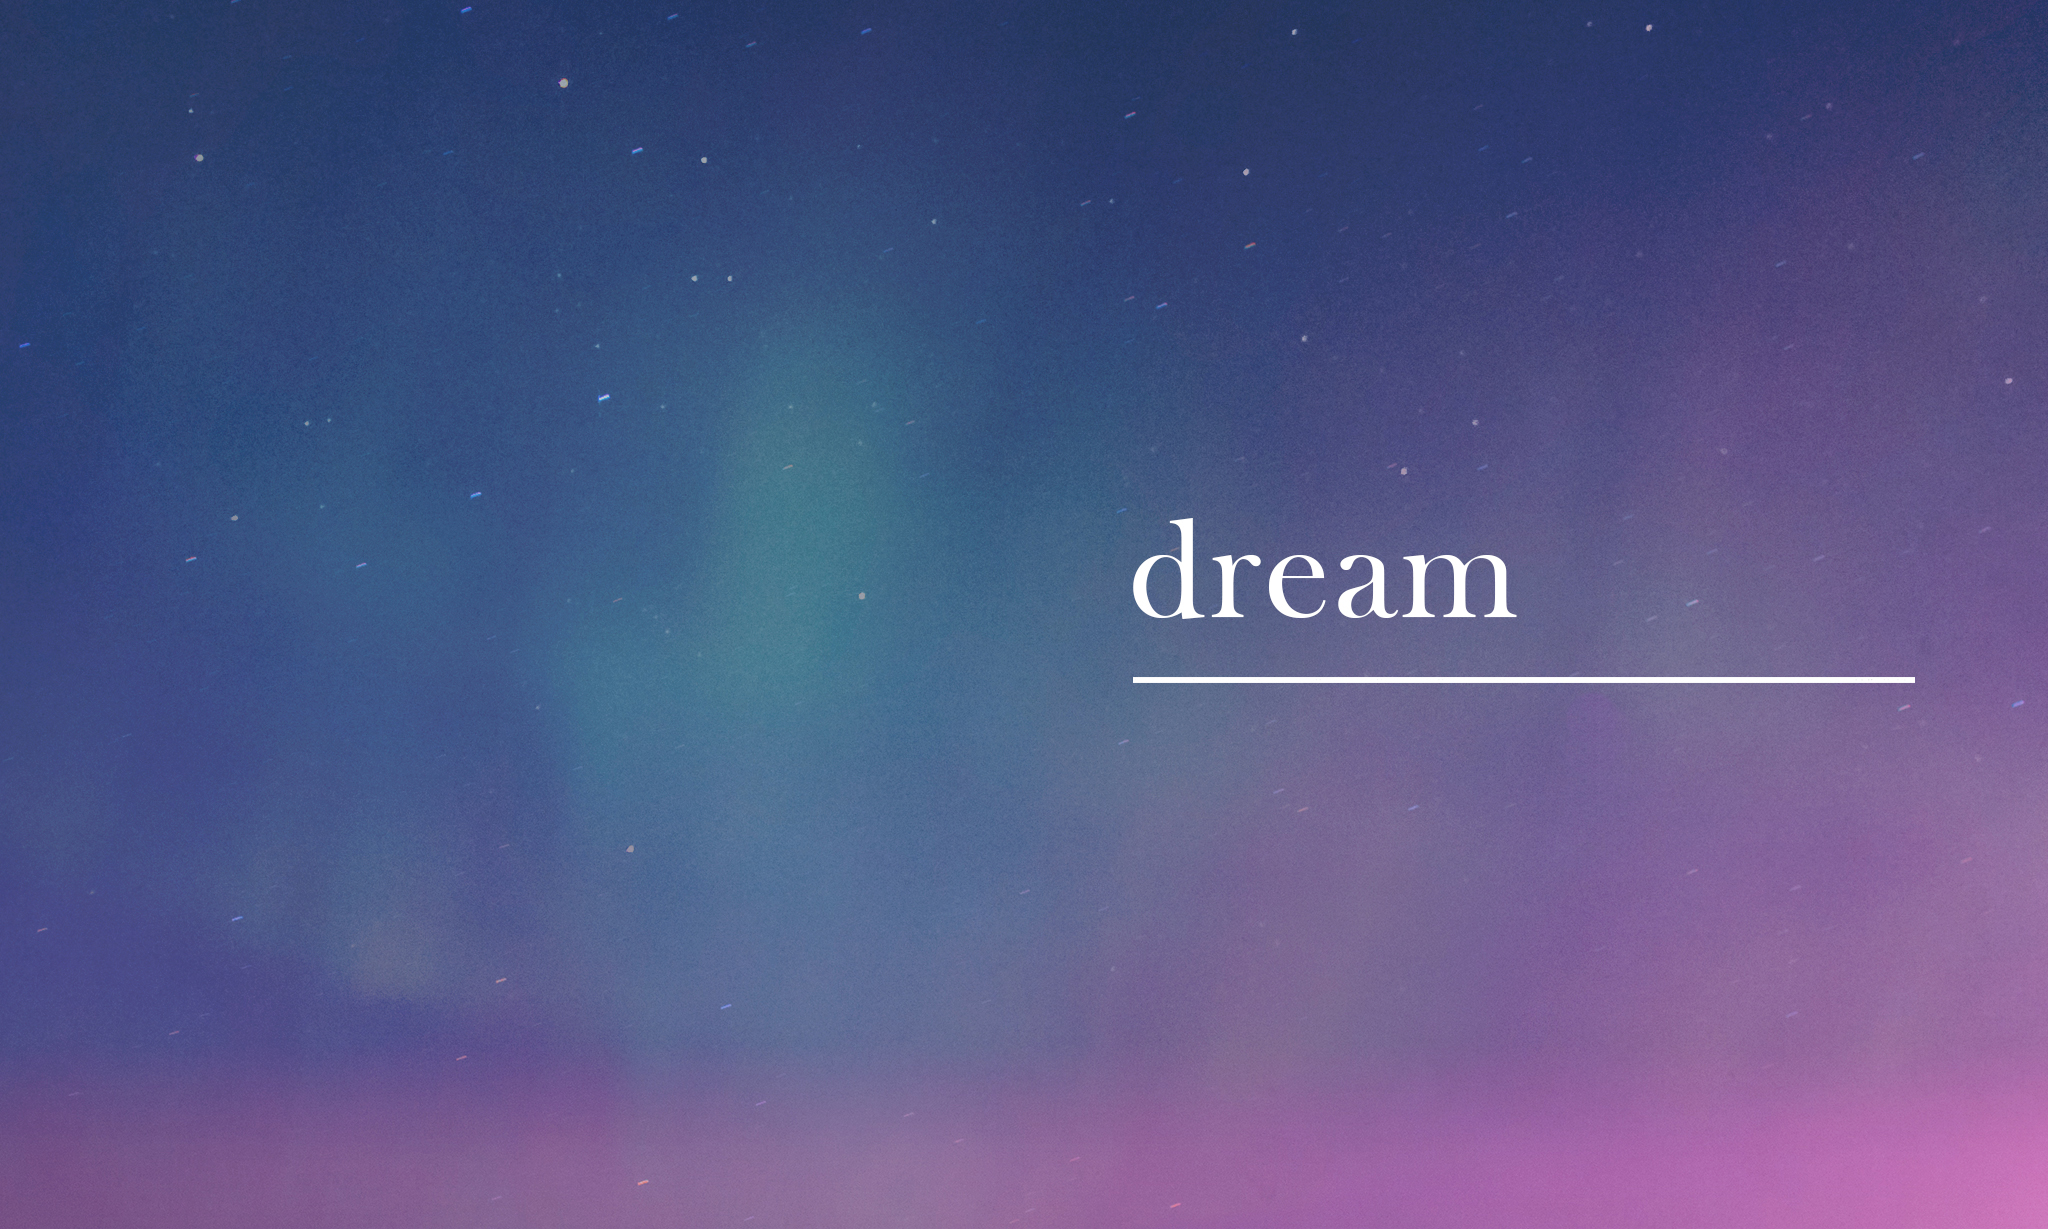 Solos_Dream_2048x1229.jpg